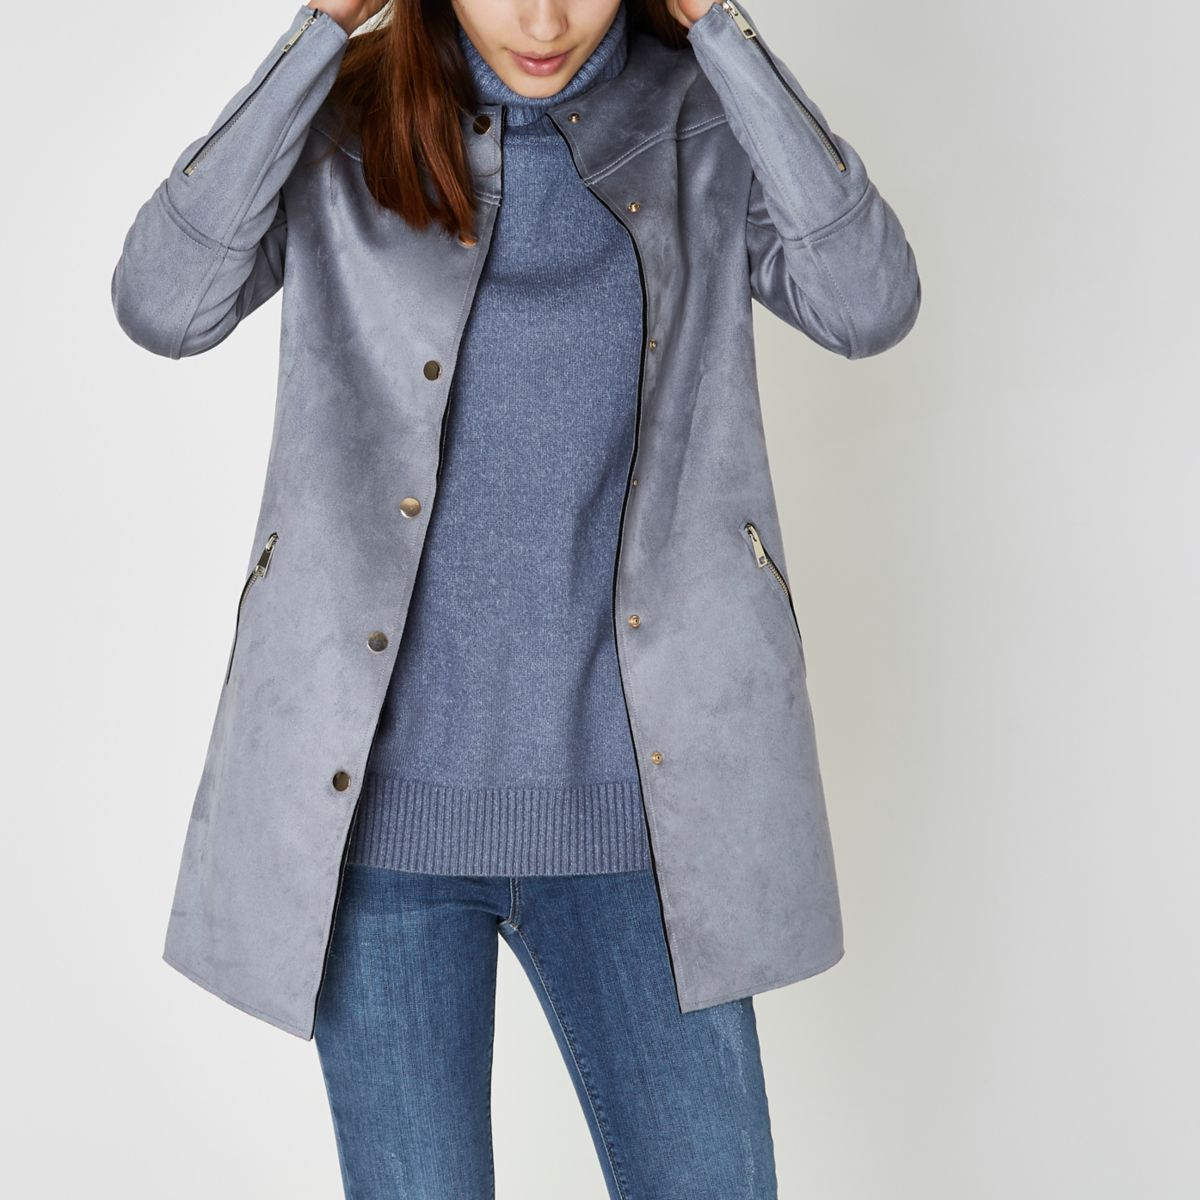 Blauer Mantel aus Wildlederimitat